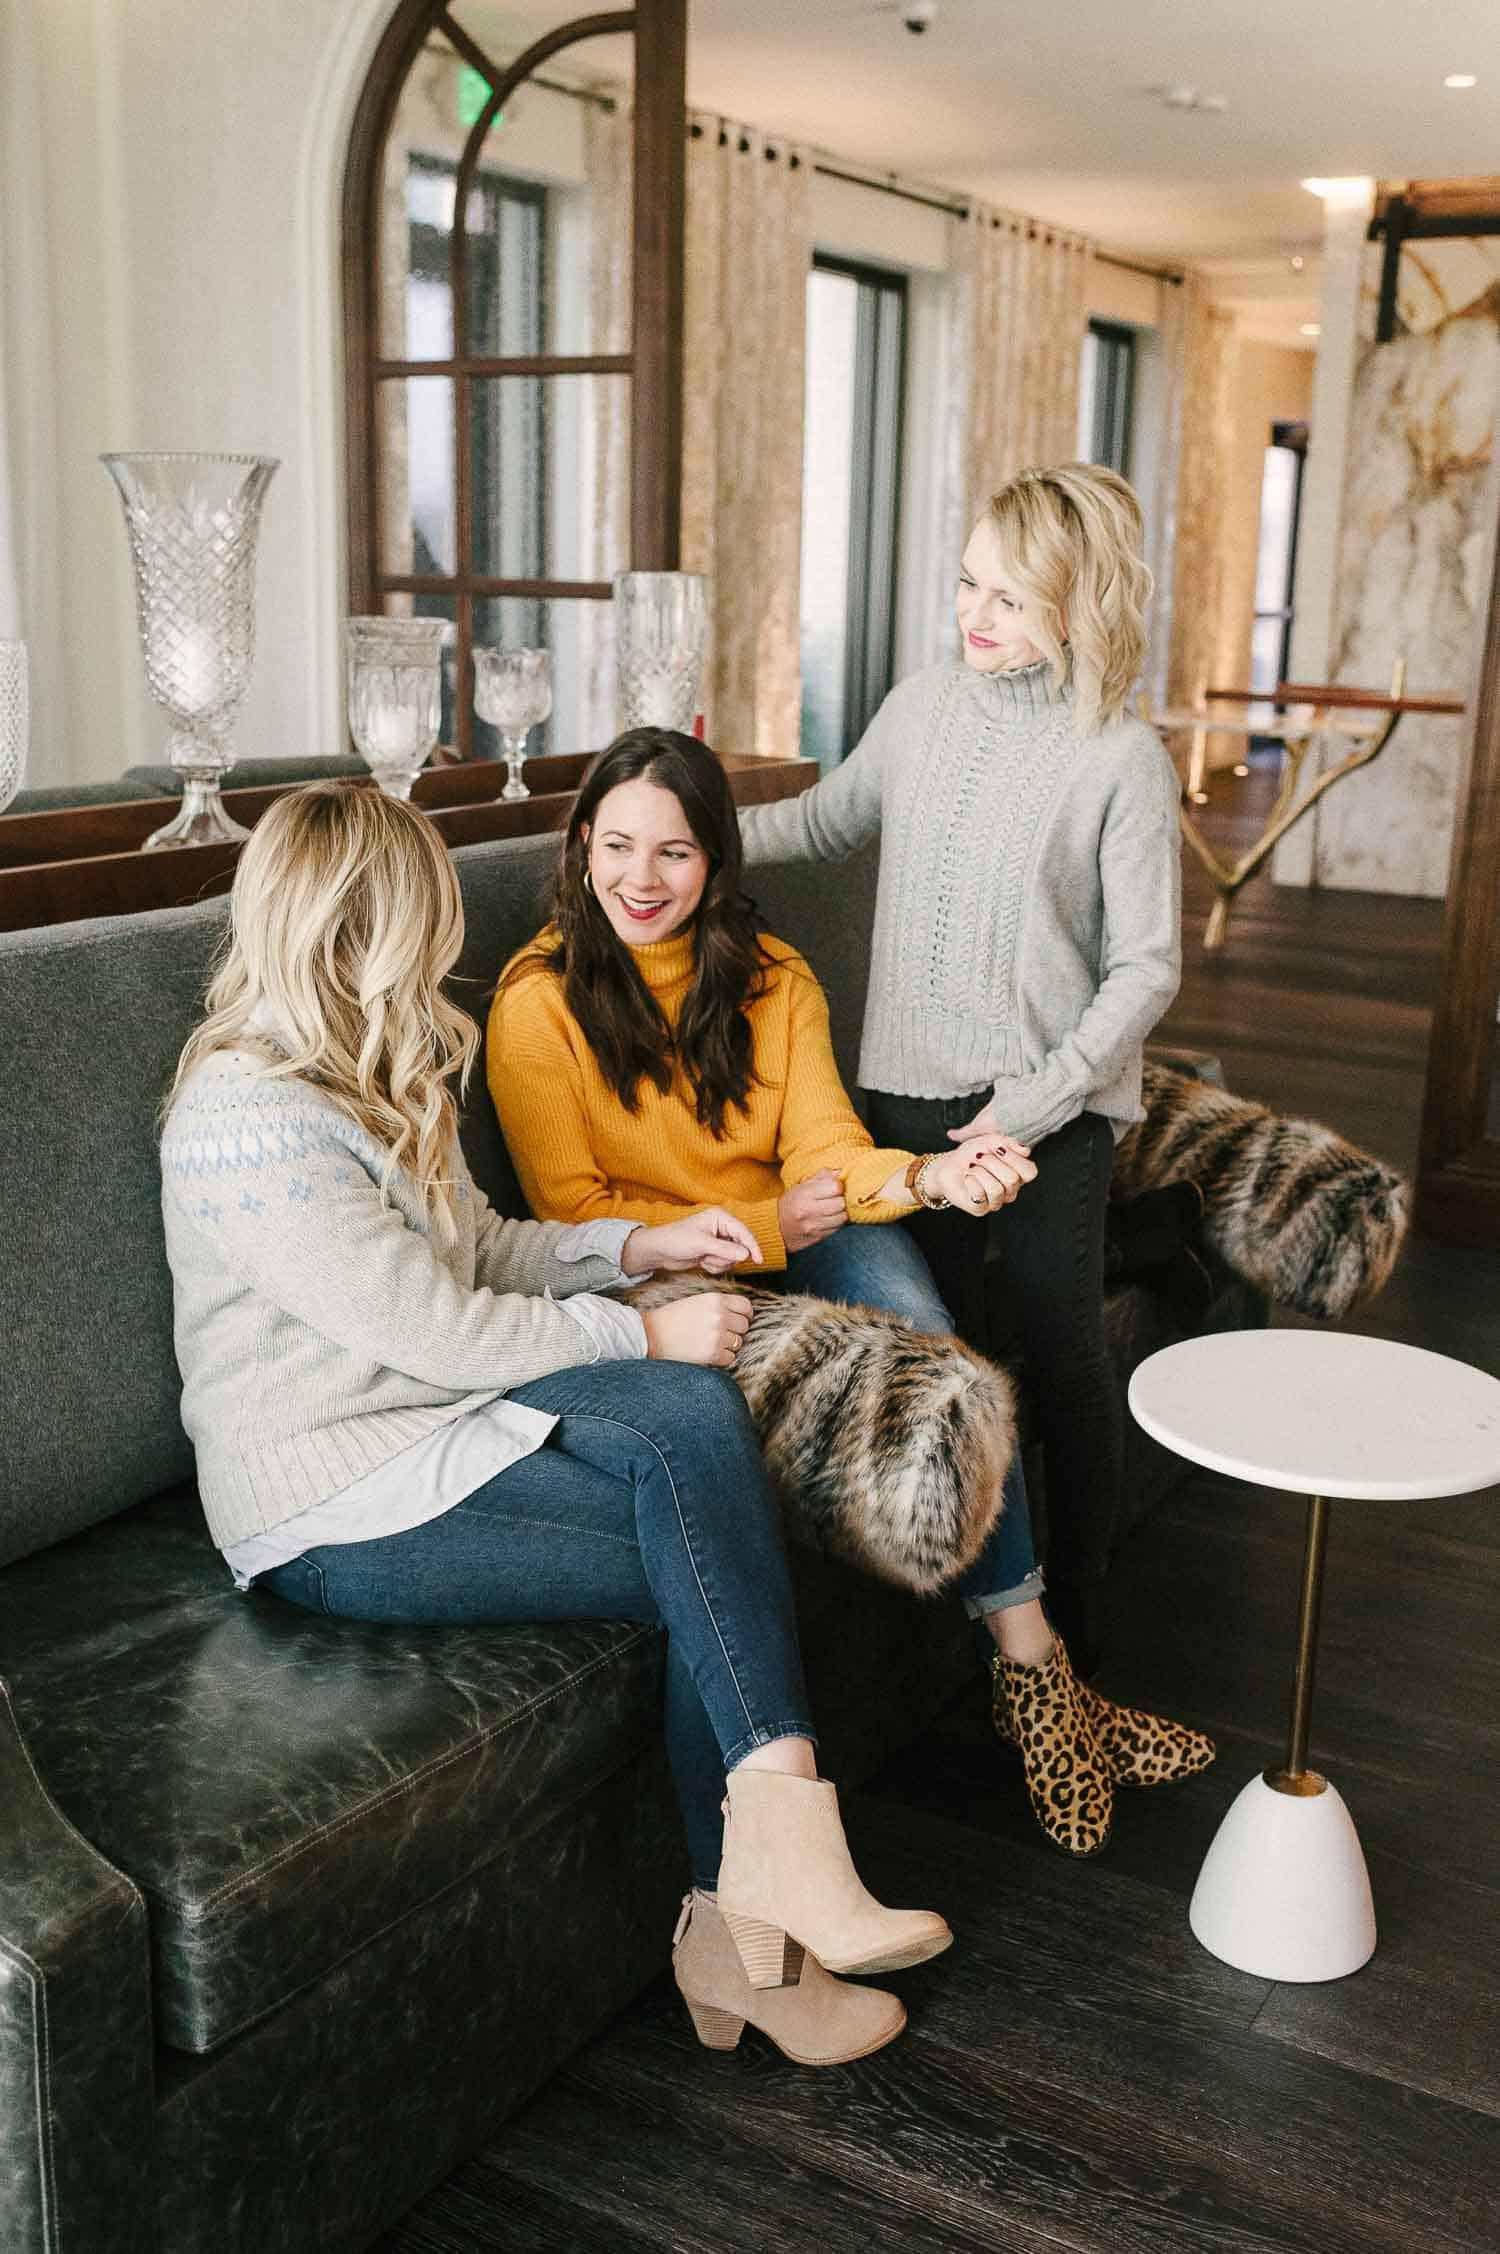 Charleston hotels, Hotel Bella Grace, girls trip ideas, reasons to take a girls trip - My Style Vita